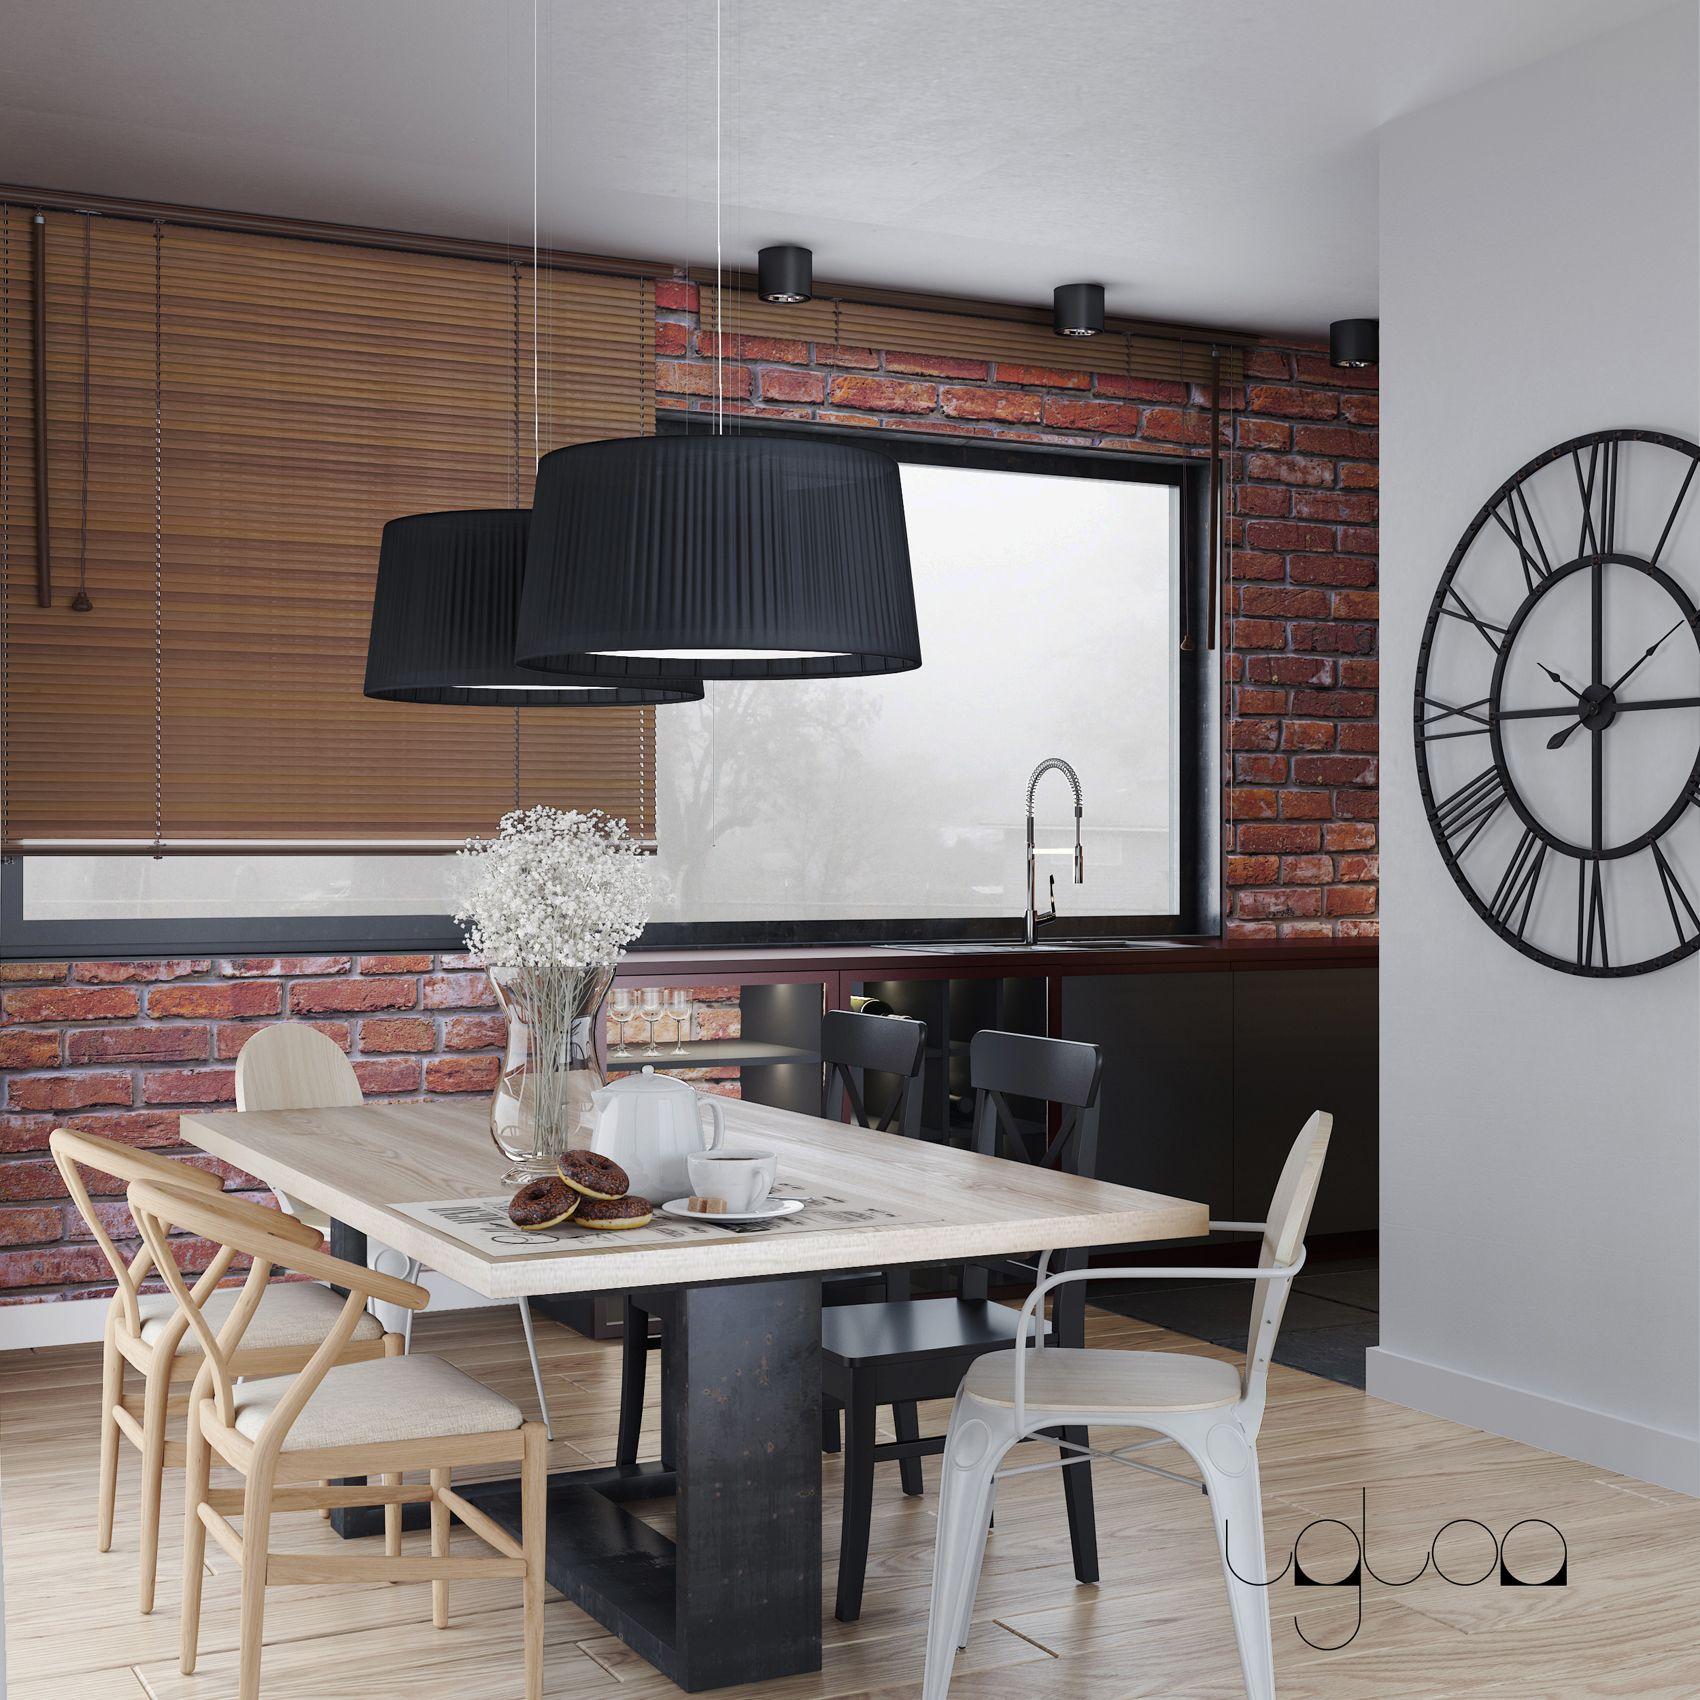 Jadalnia W Stylu Soft Loft Home Decor Conference Room Table Decor